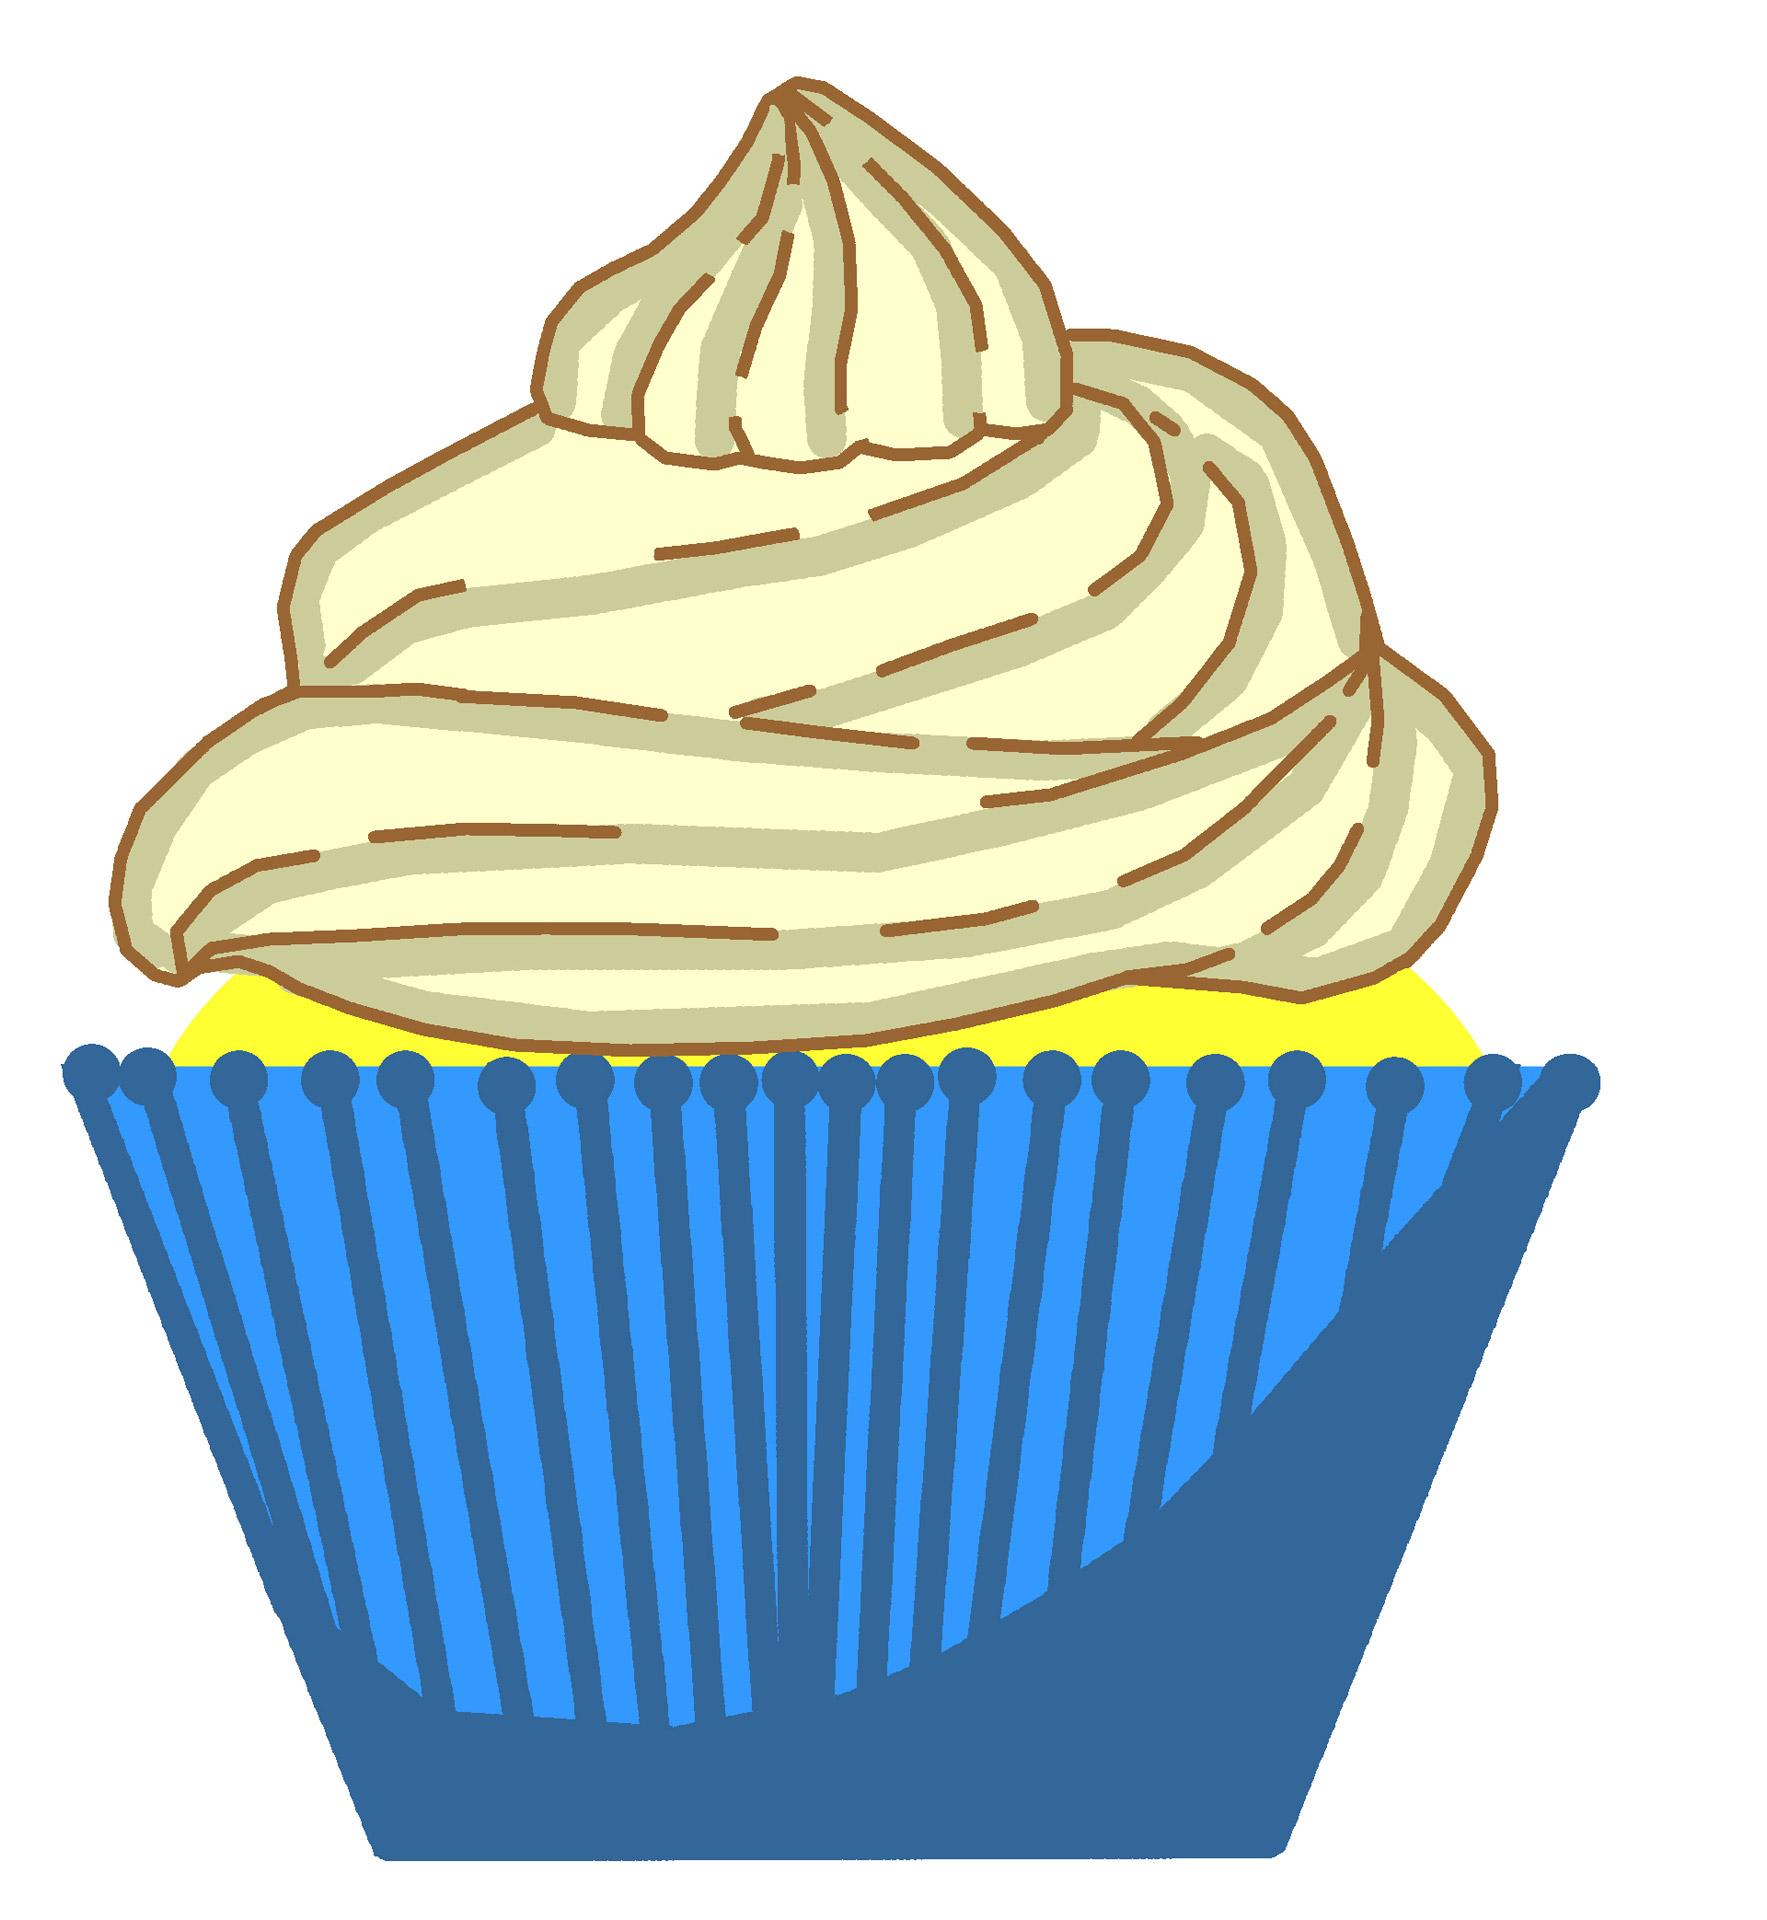 Blue clipart cupcake. Vanilla free stock photo